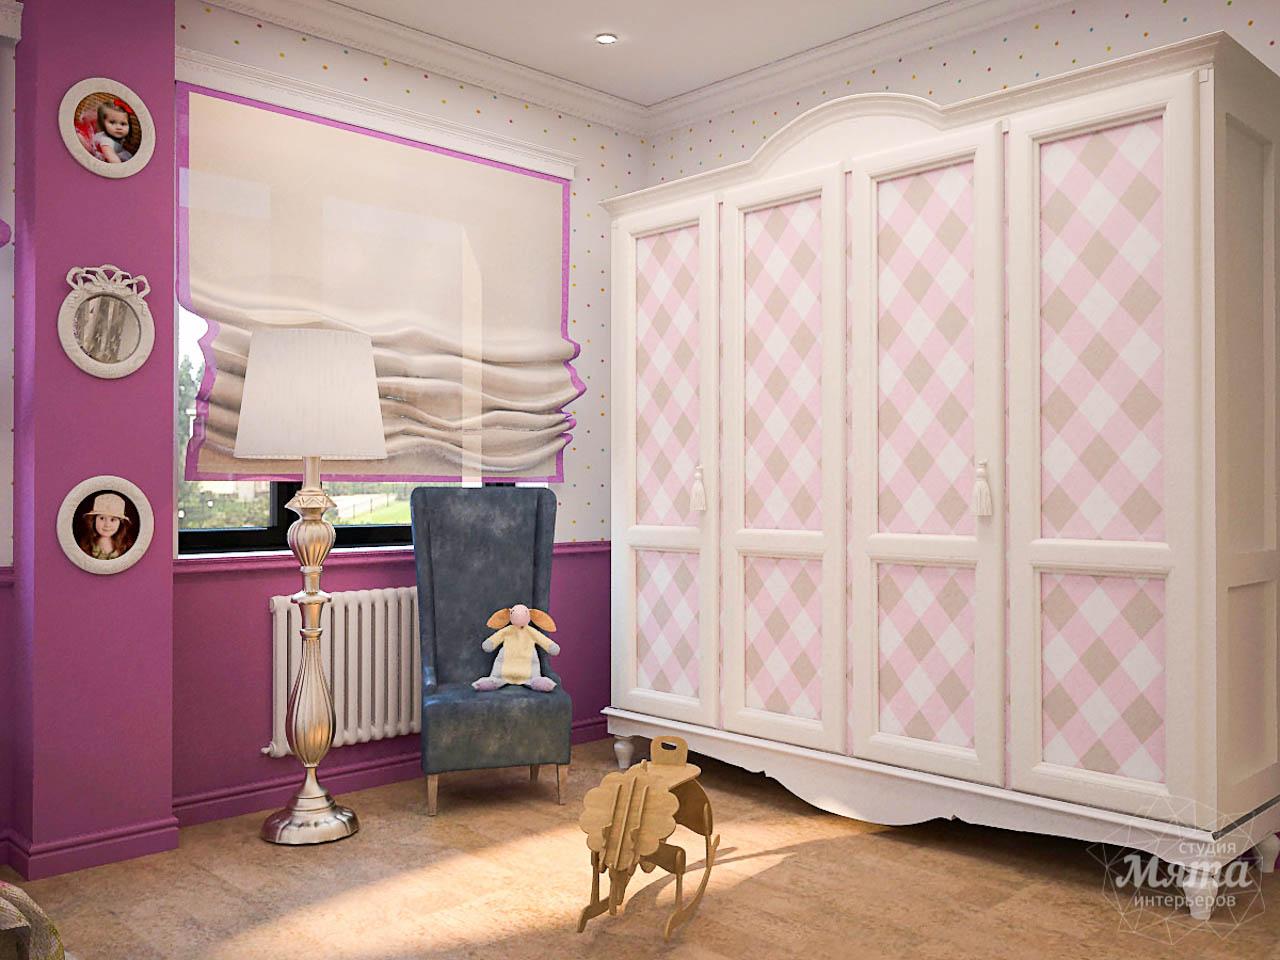 Дизайн интерьера коттеджа по ул. Ландышевая 23 img1259910979